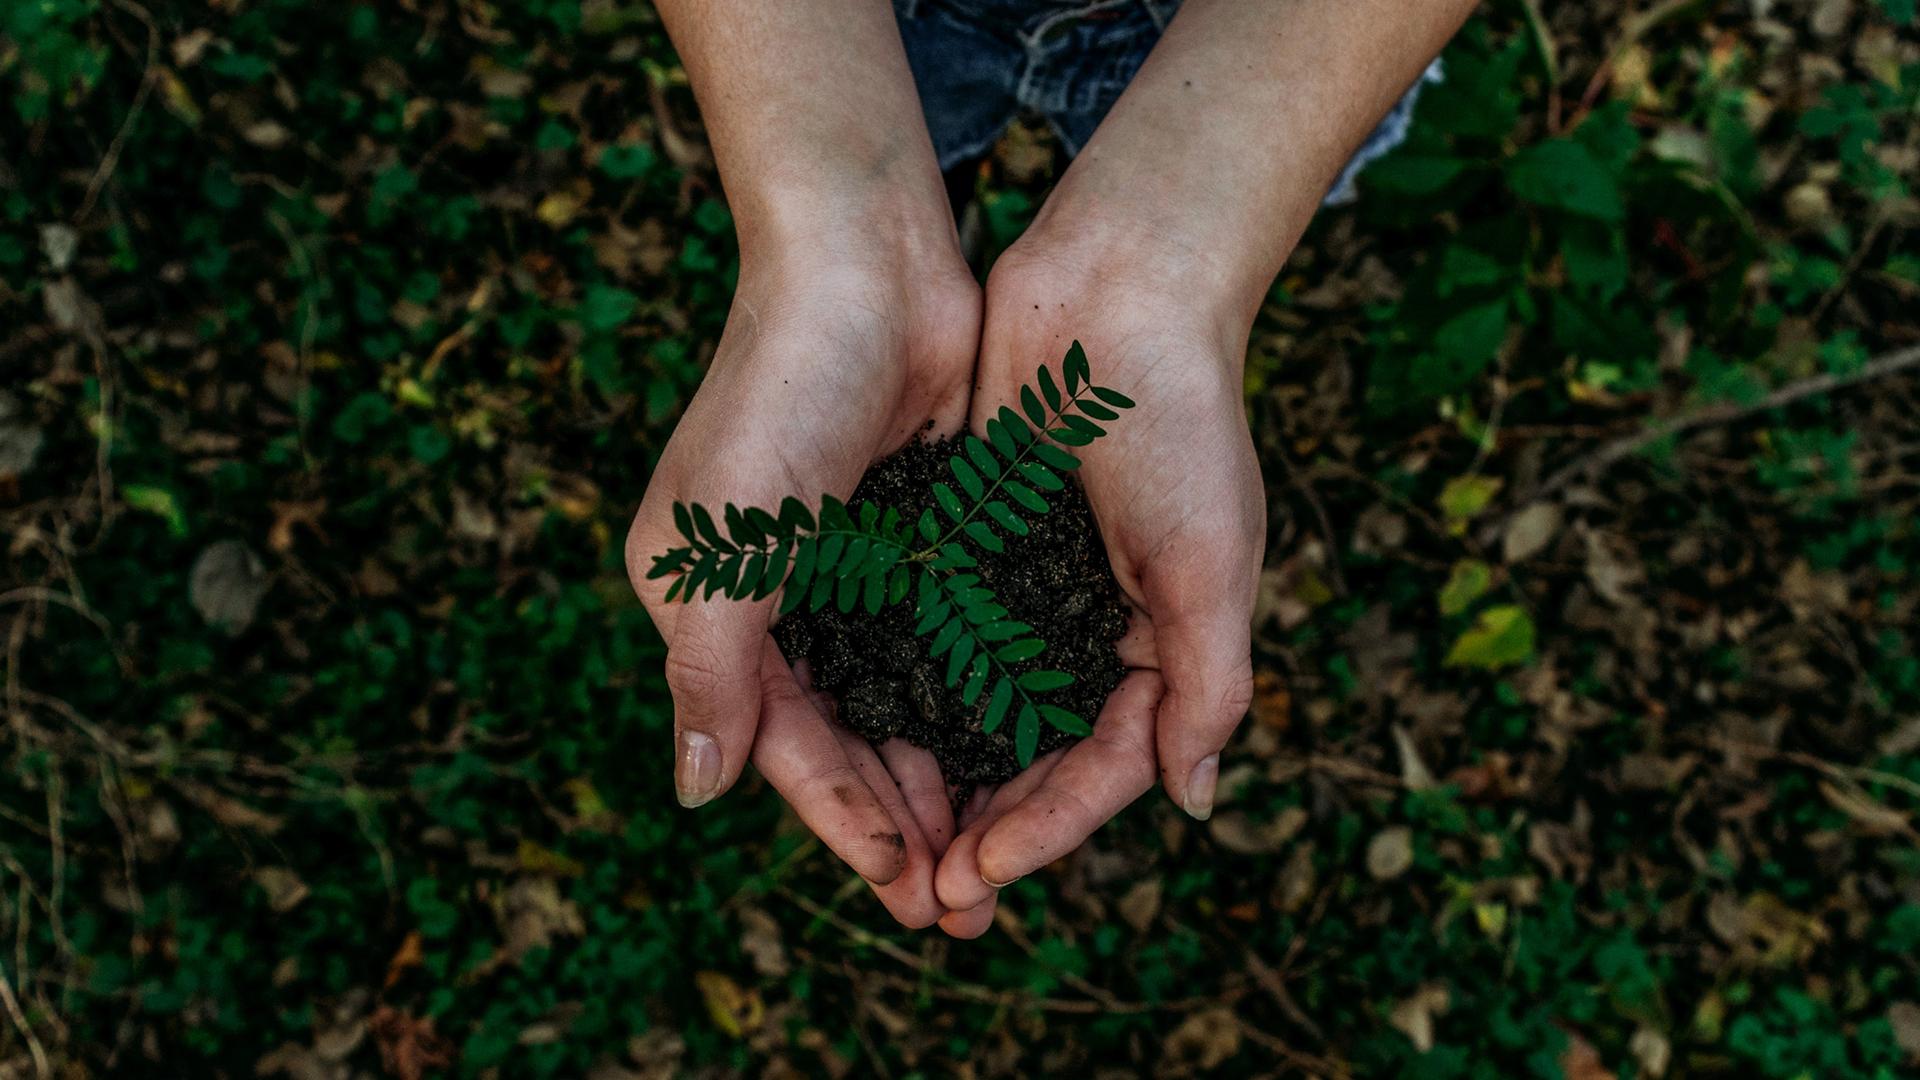 Trillion_trees_Planting trees.jpg